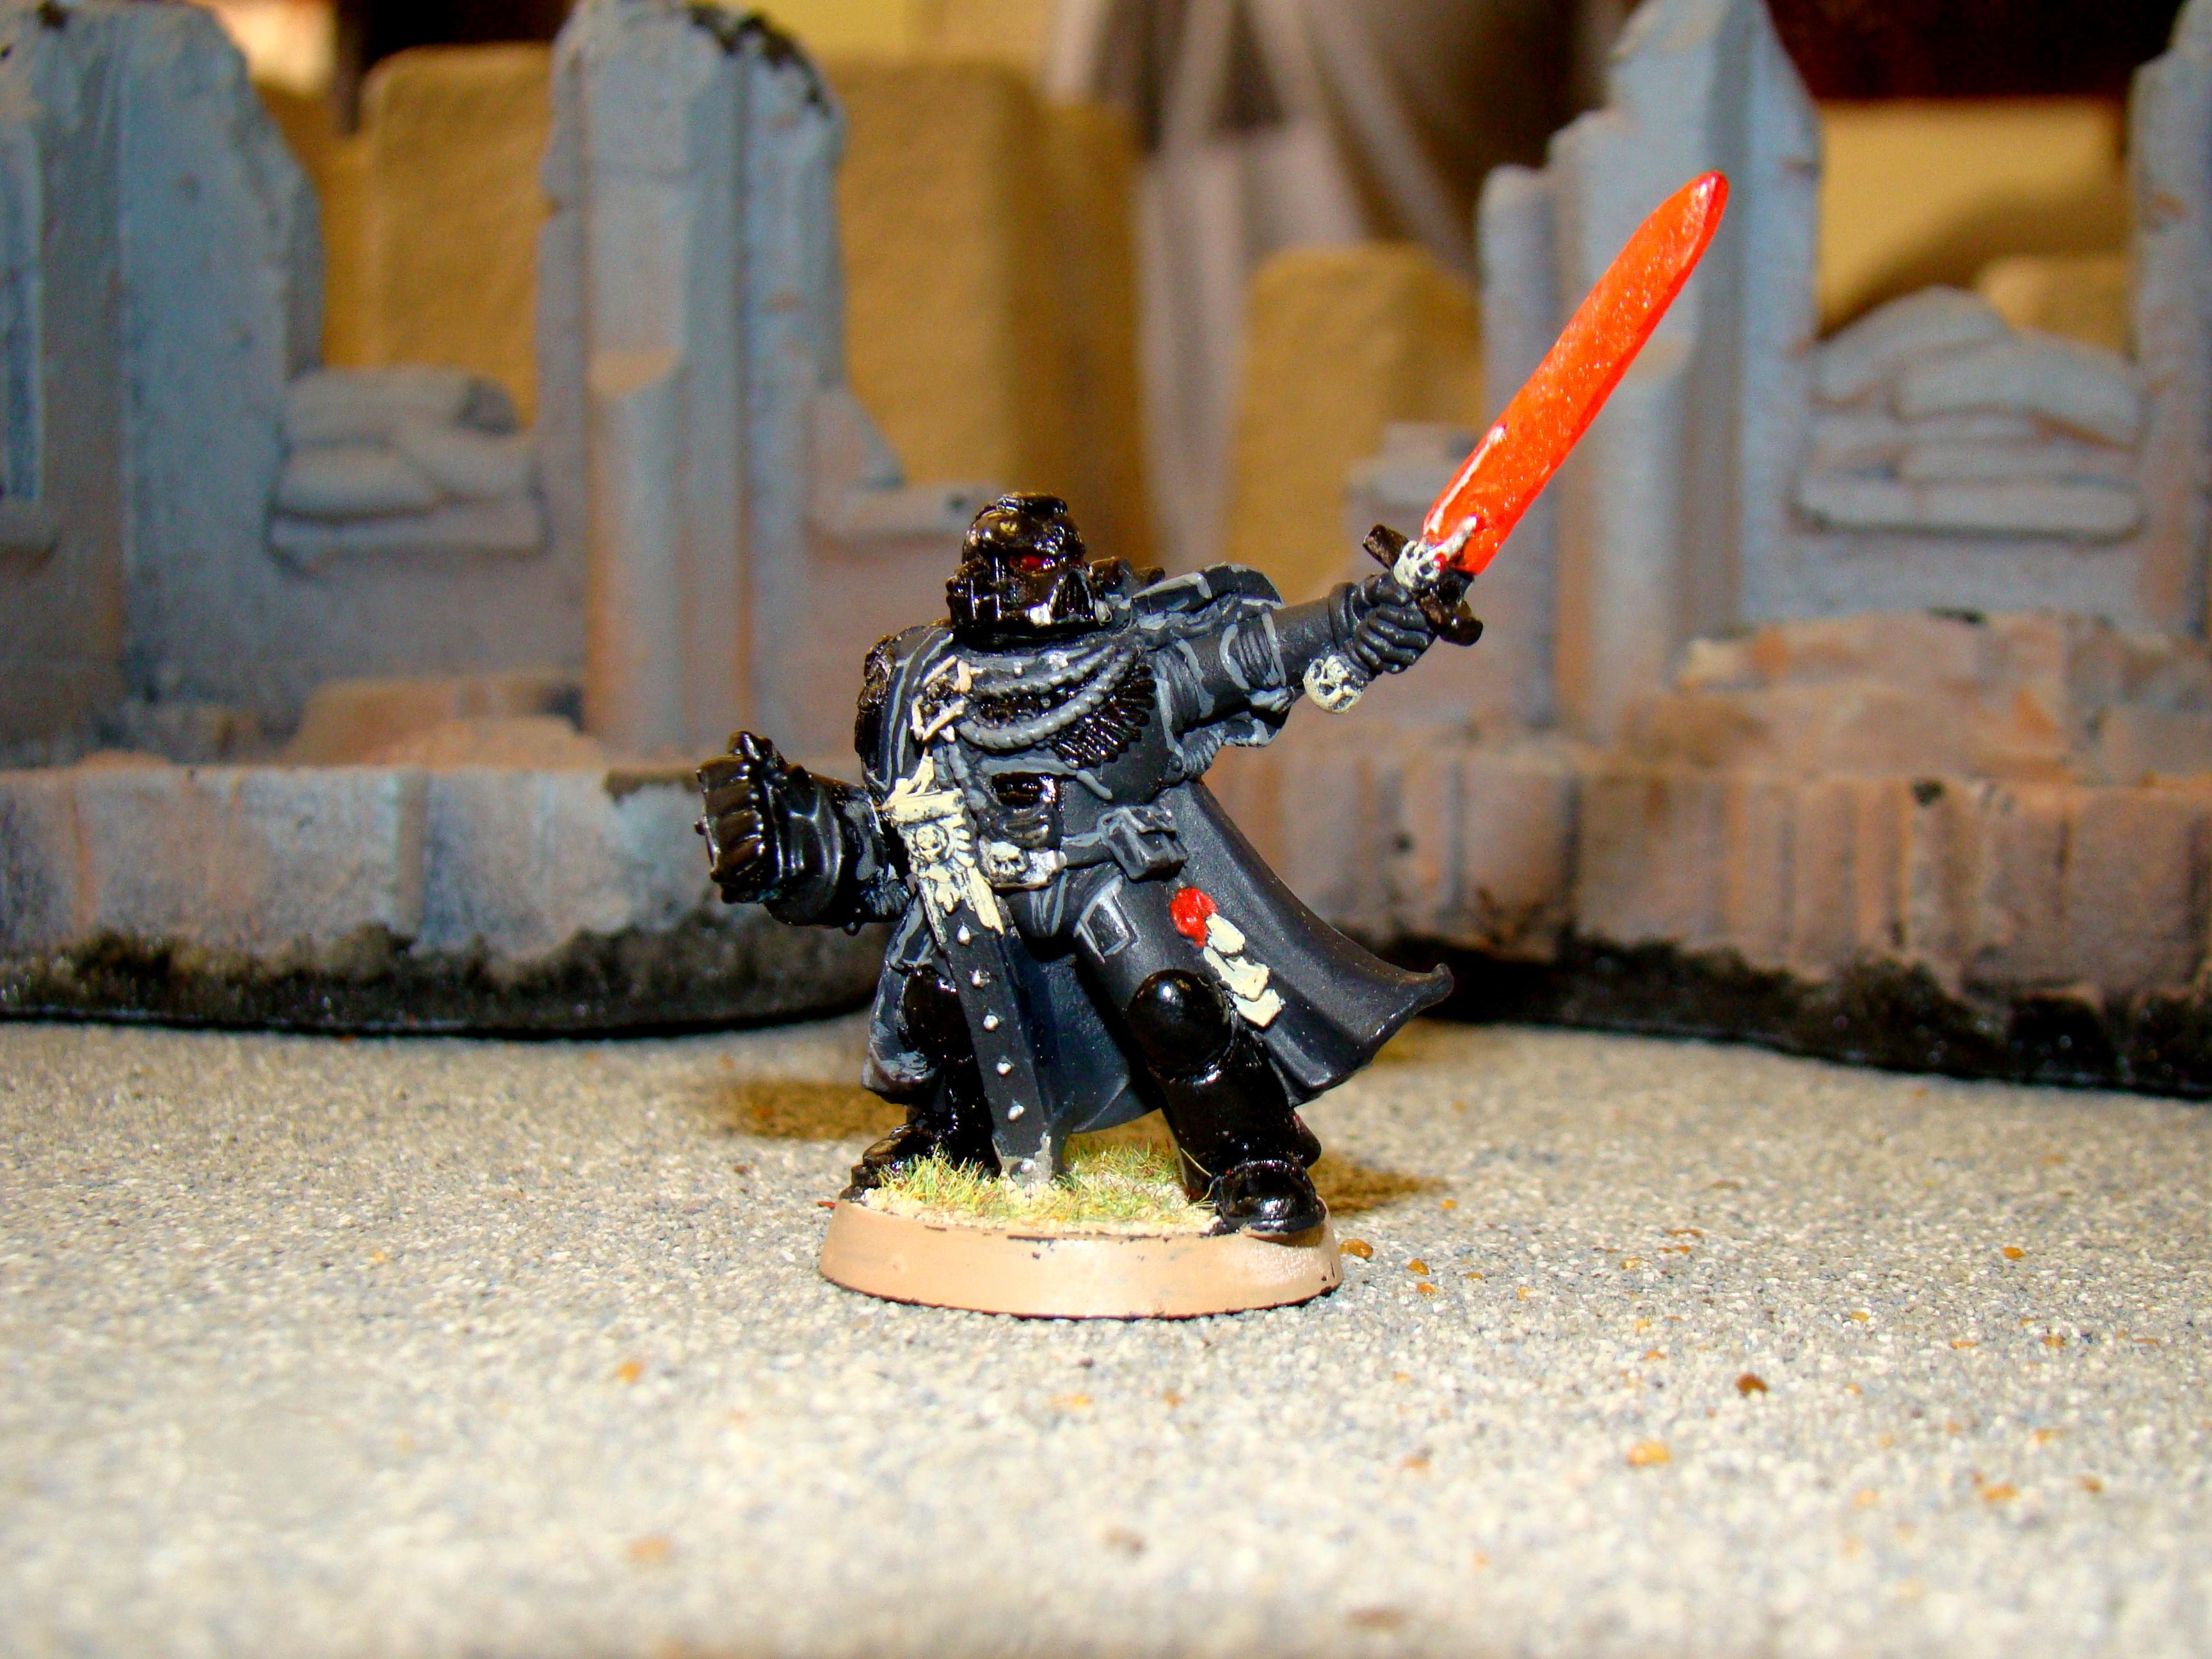 Darth Vader, Inquisition, Inquisitor, Star Wars